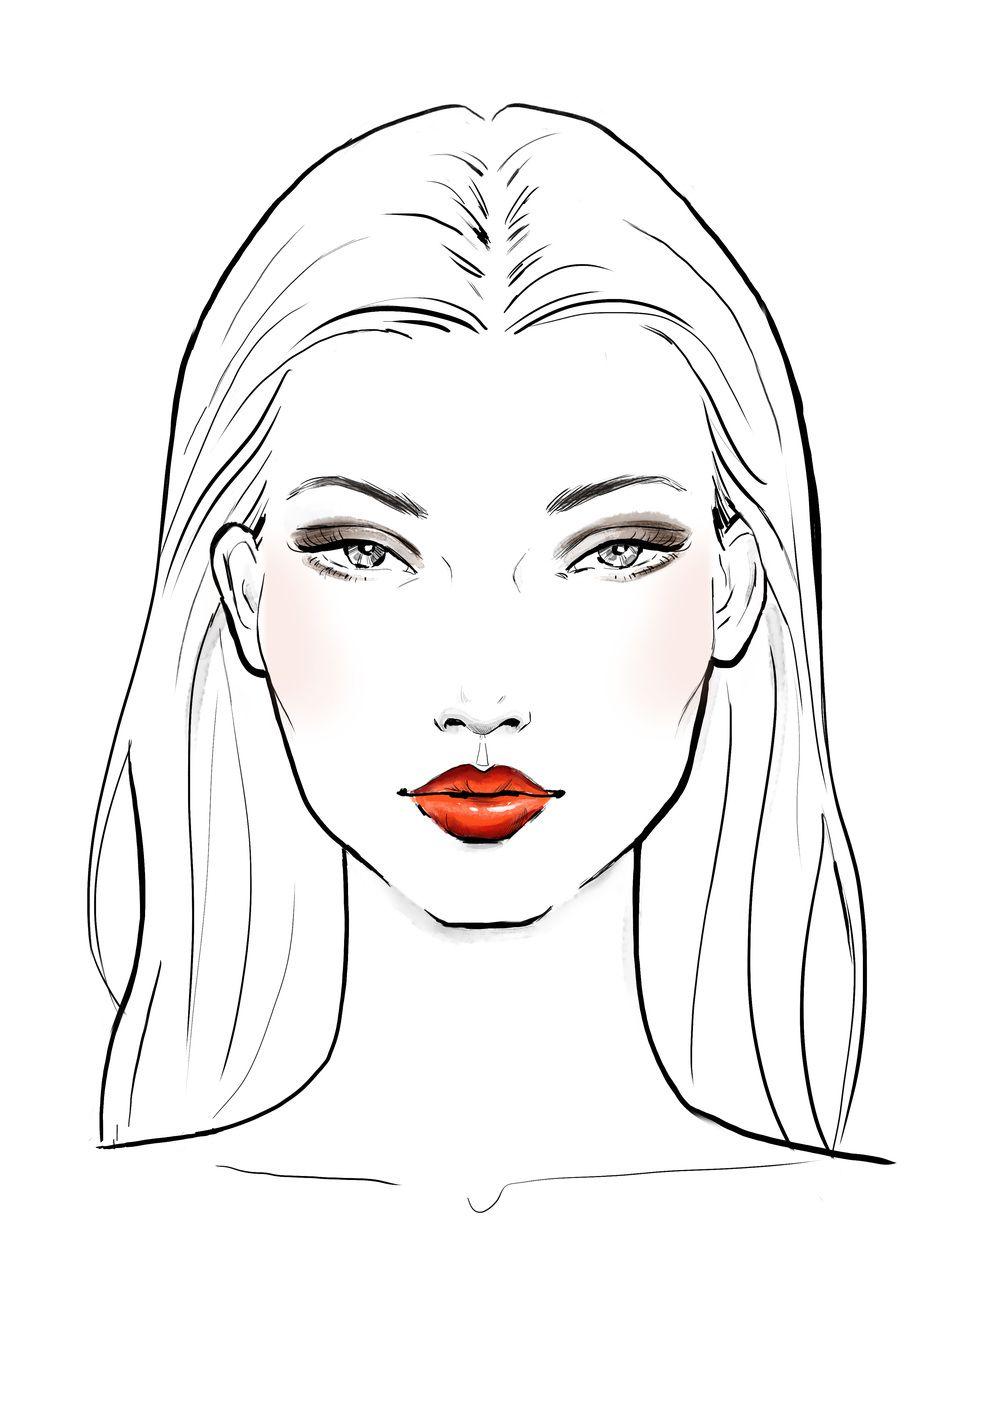 Sportsgirl Rostro De Mujer Dibujo Bocetos De Diseno De Moda Ilustracion De Moda